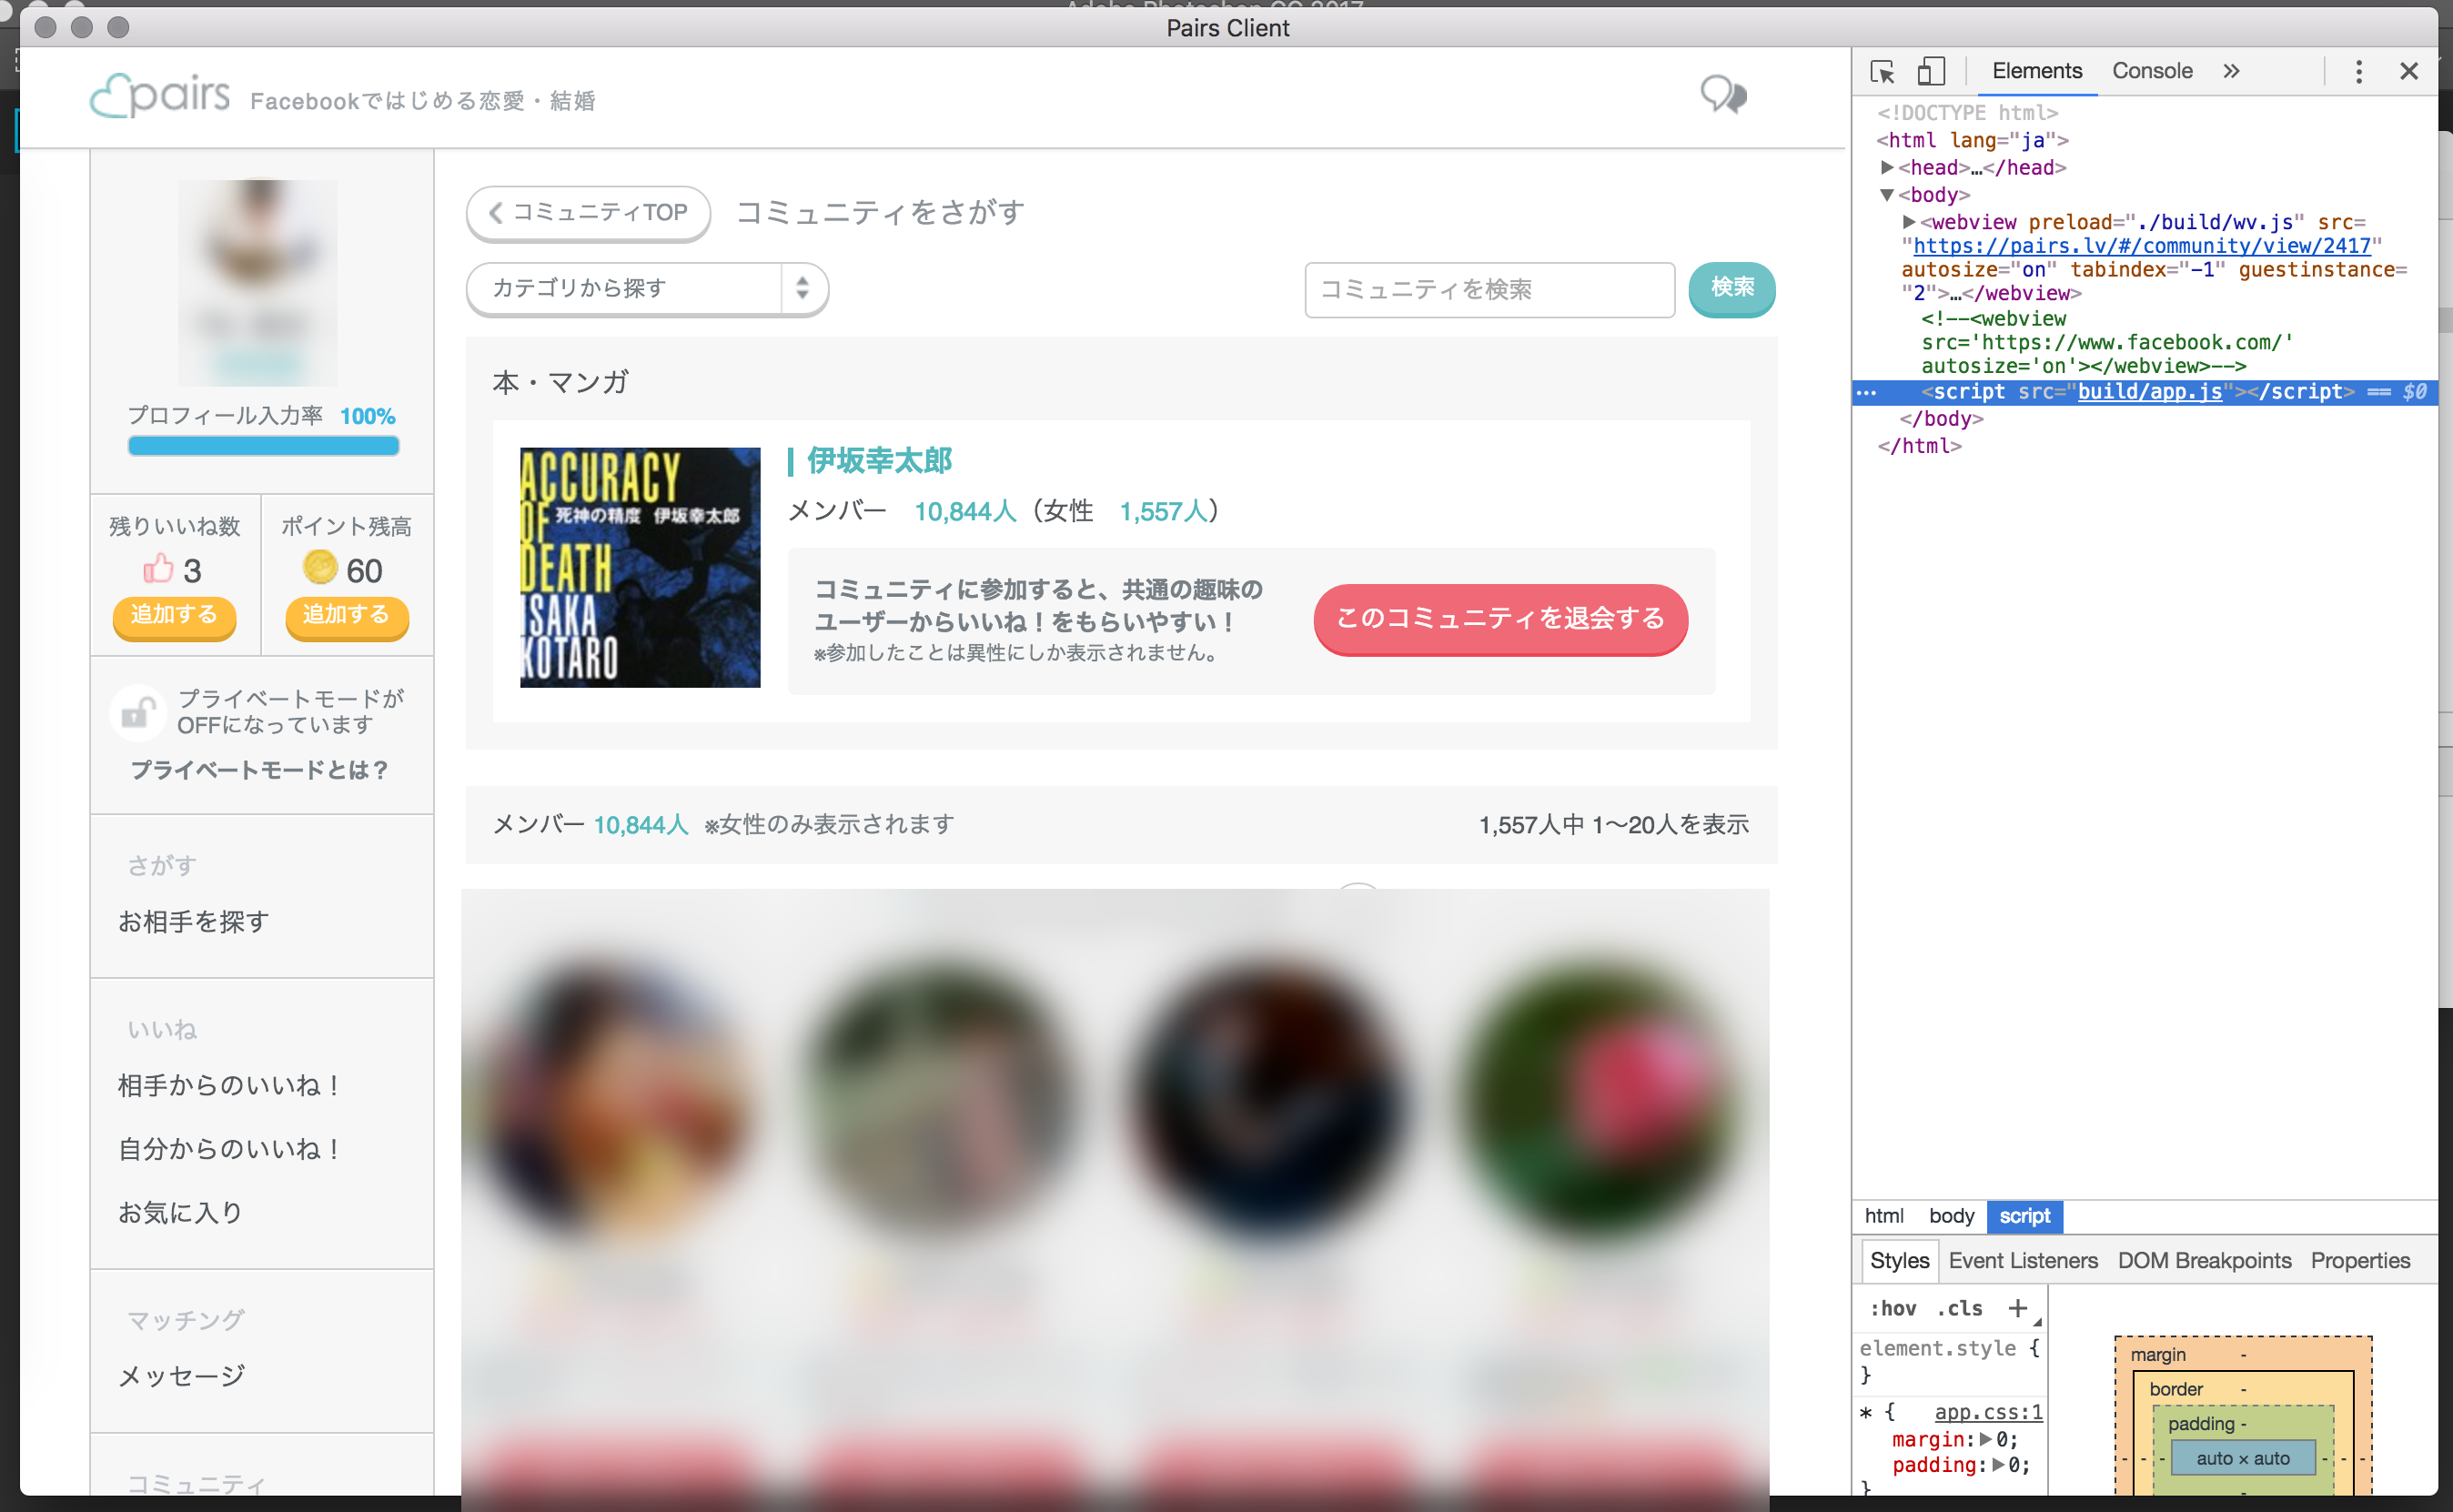 Screenshot 2017-07-12 23.02.53.png